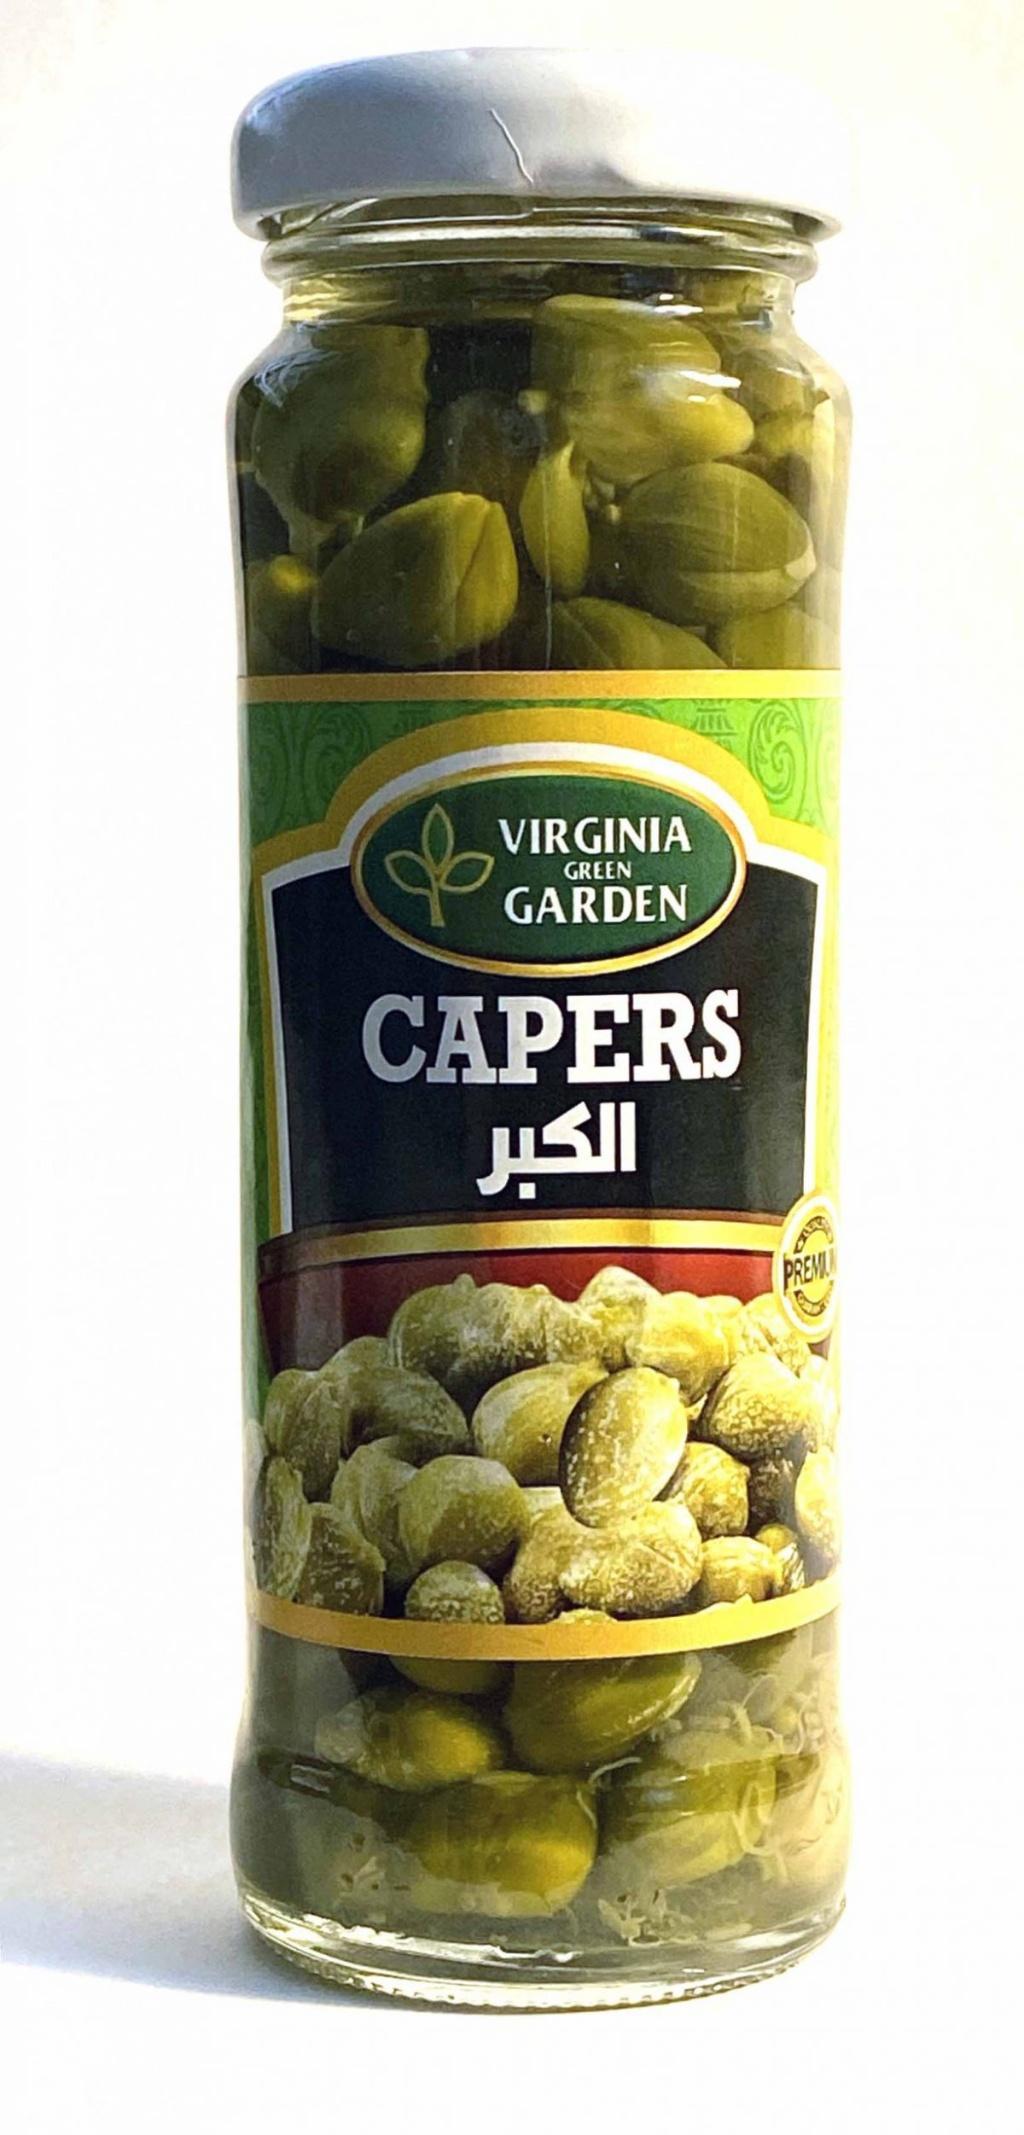 Virginia Green Garden Capers 60g